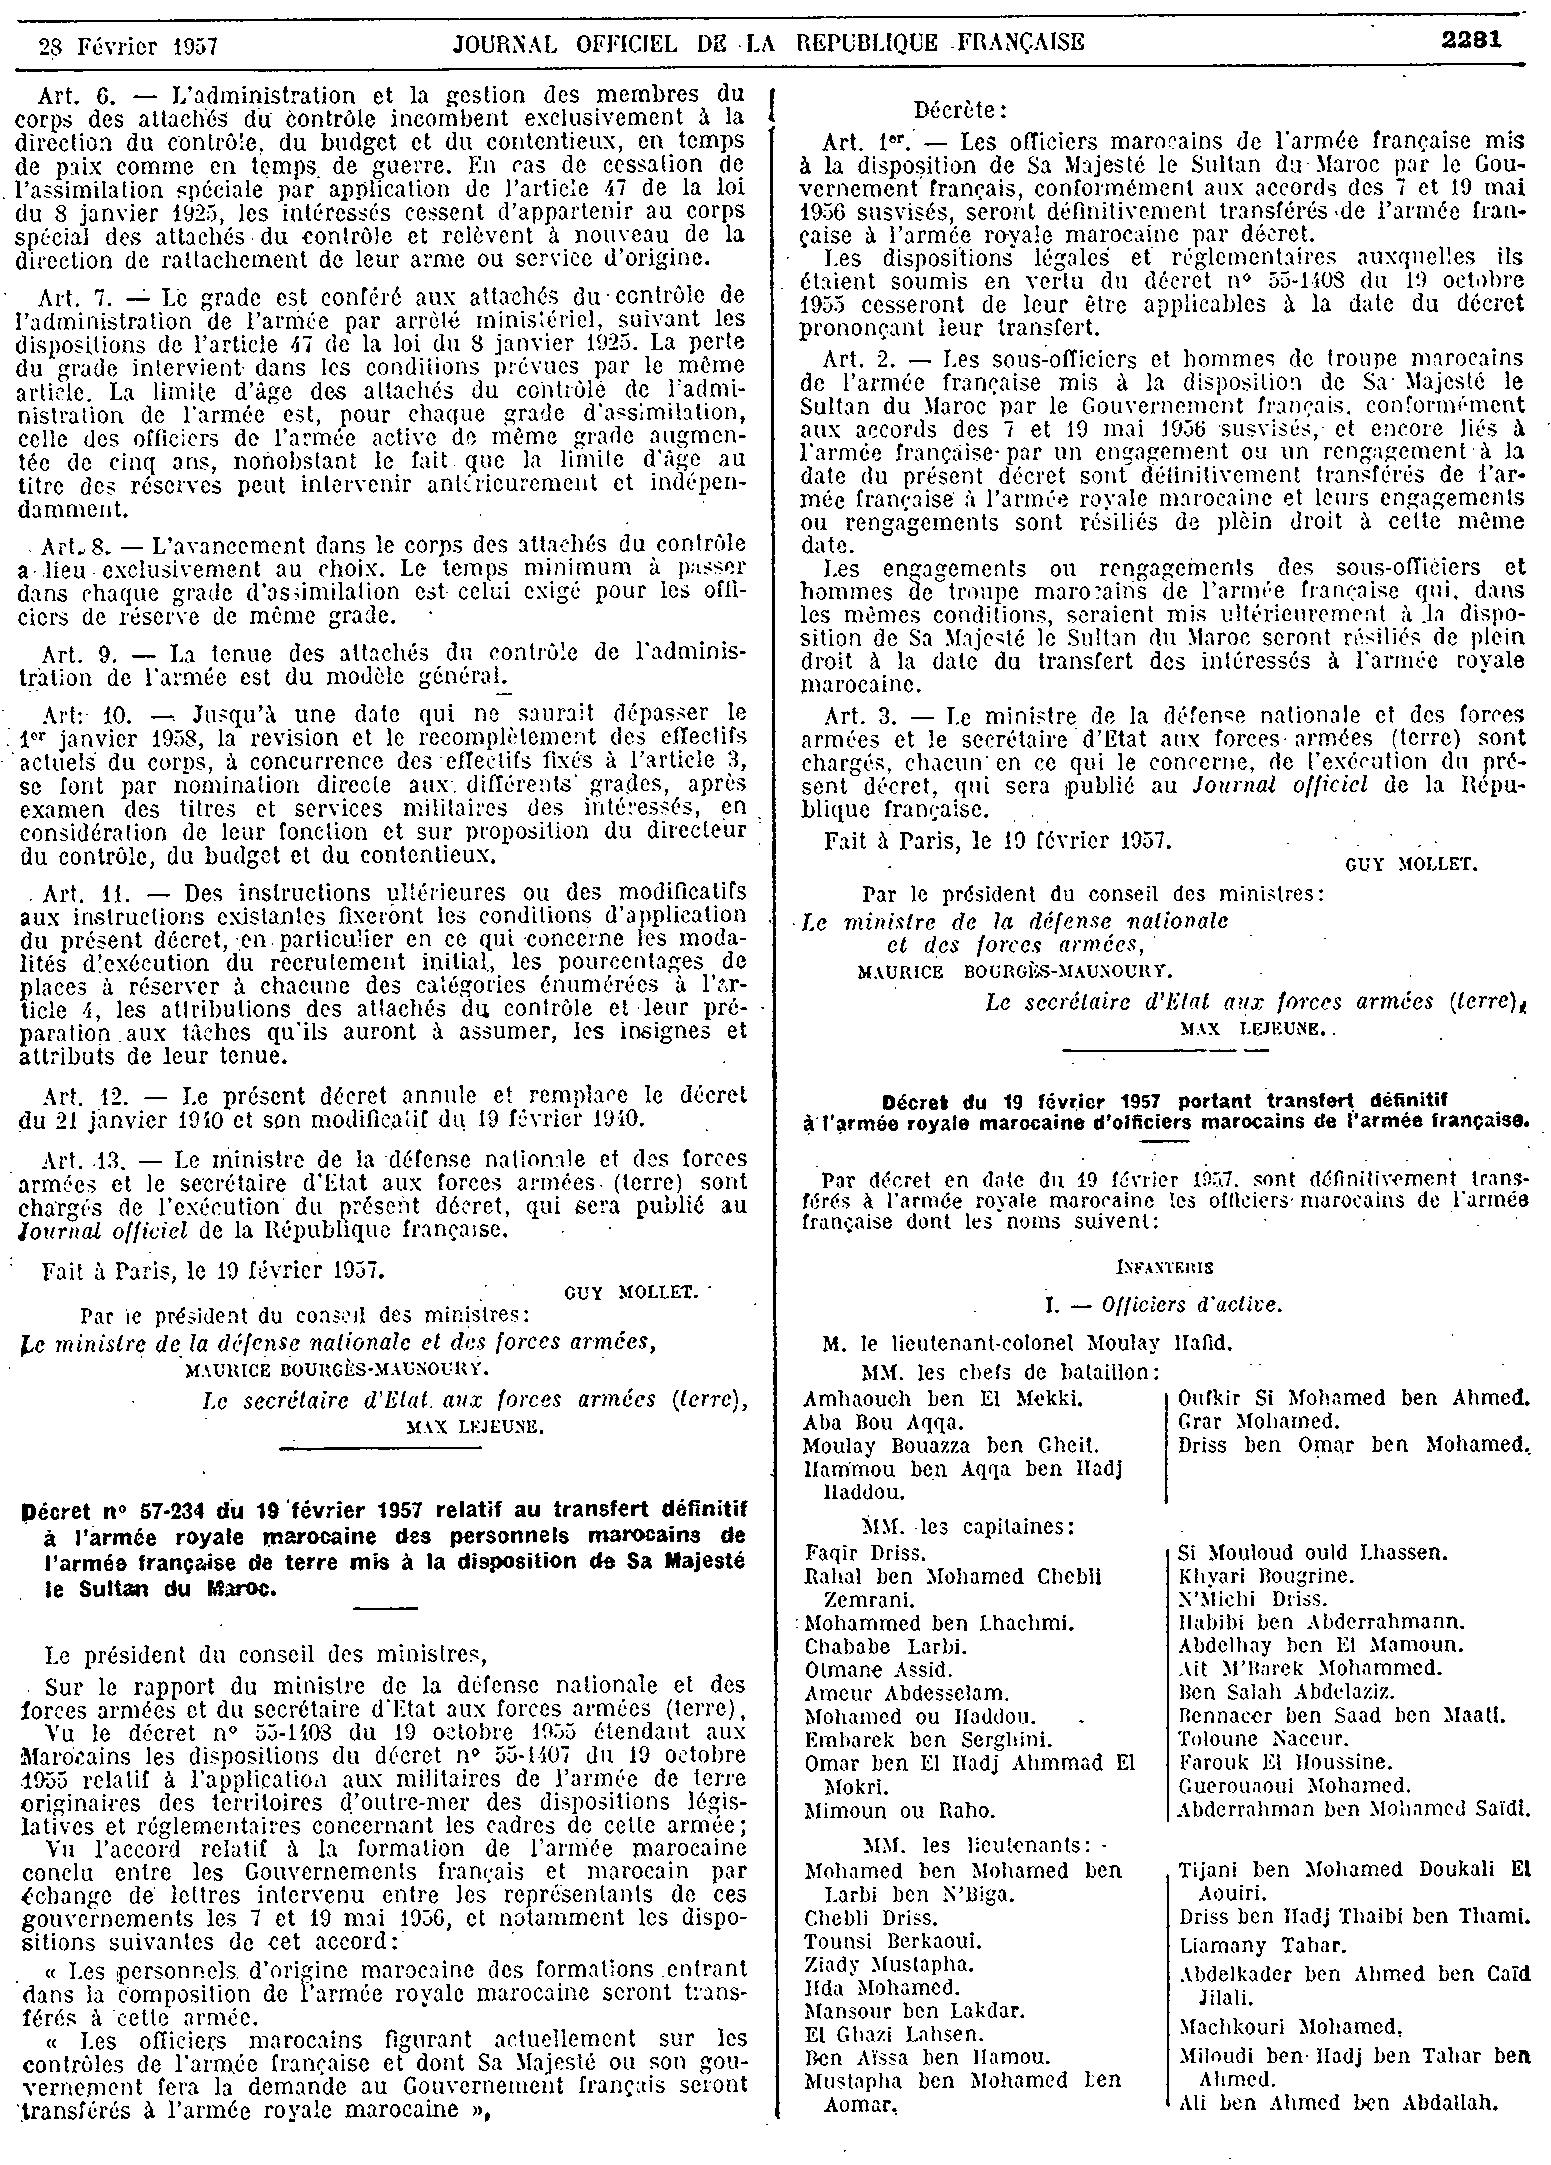 Création des F.A.R. - 14 mai 1956 32747330575_bd21656f6b_o